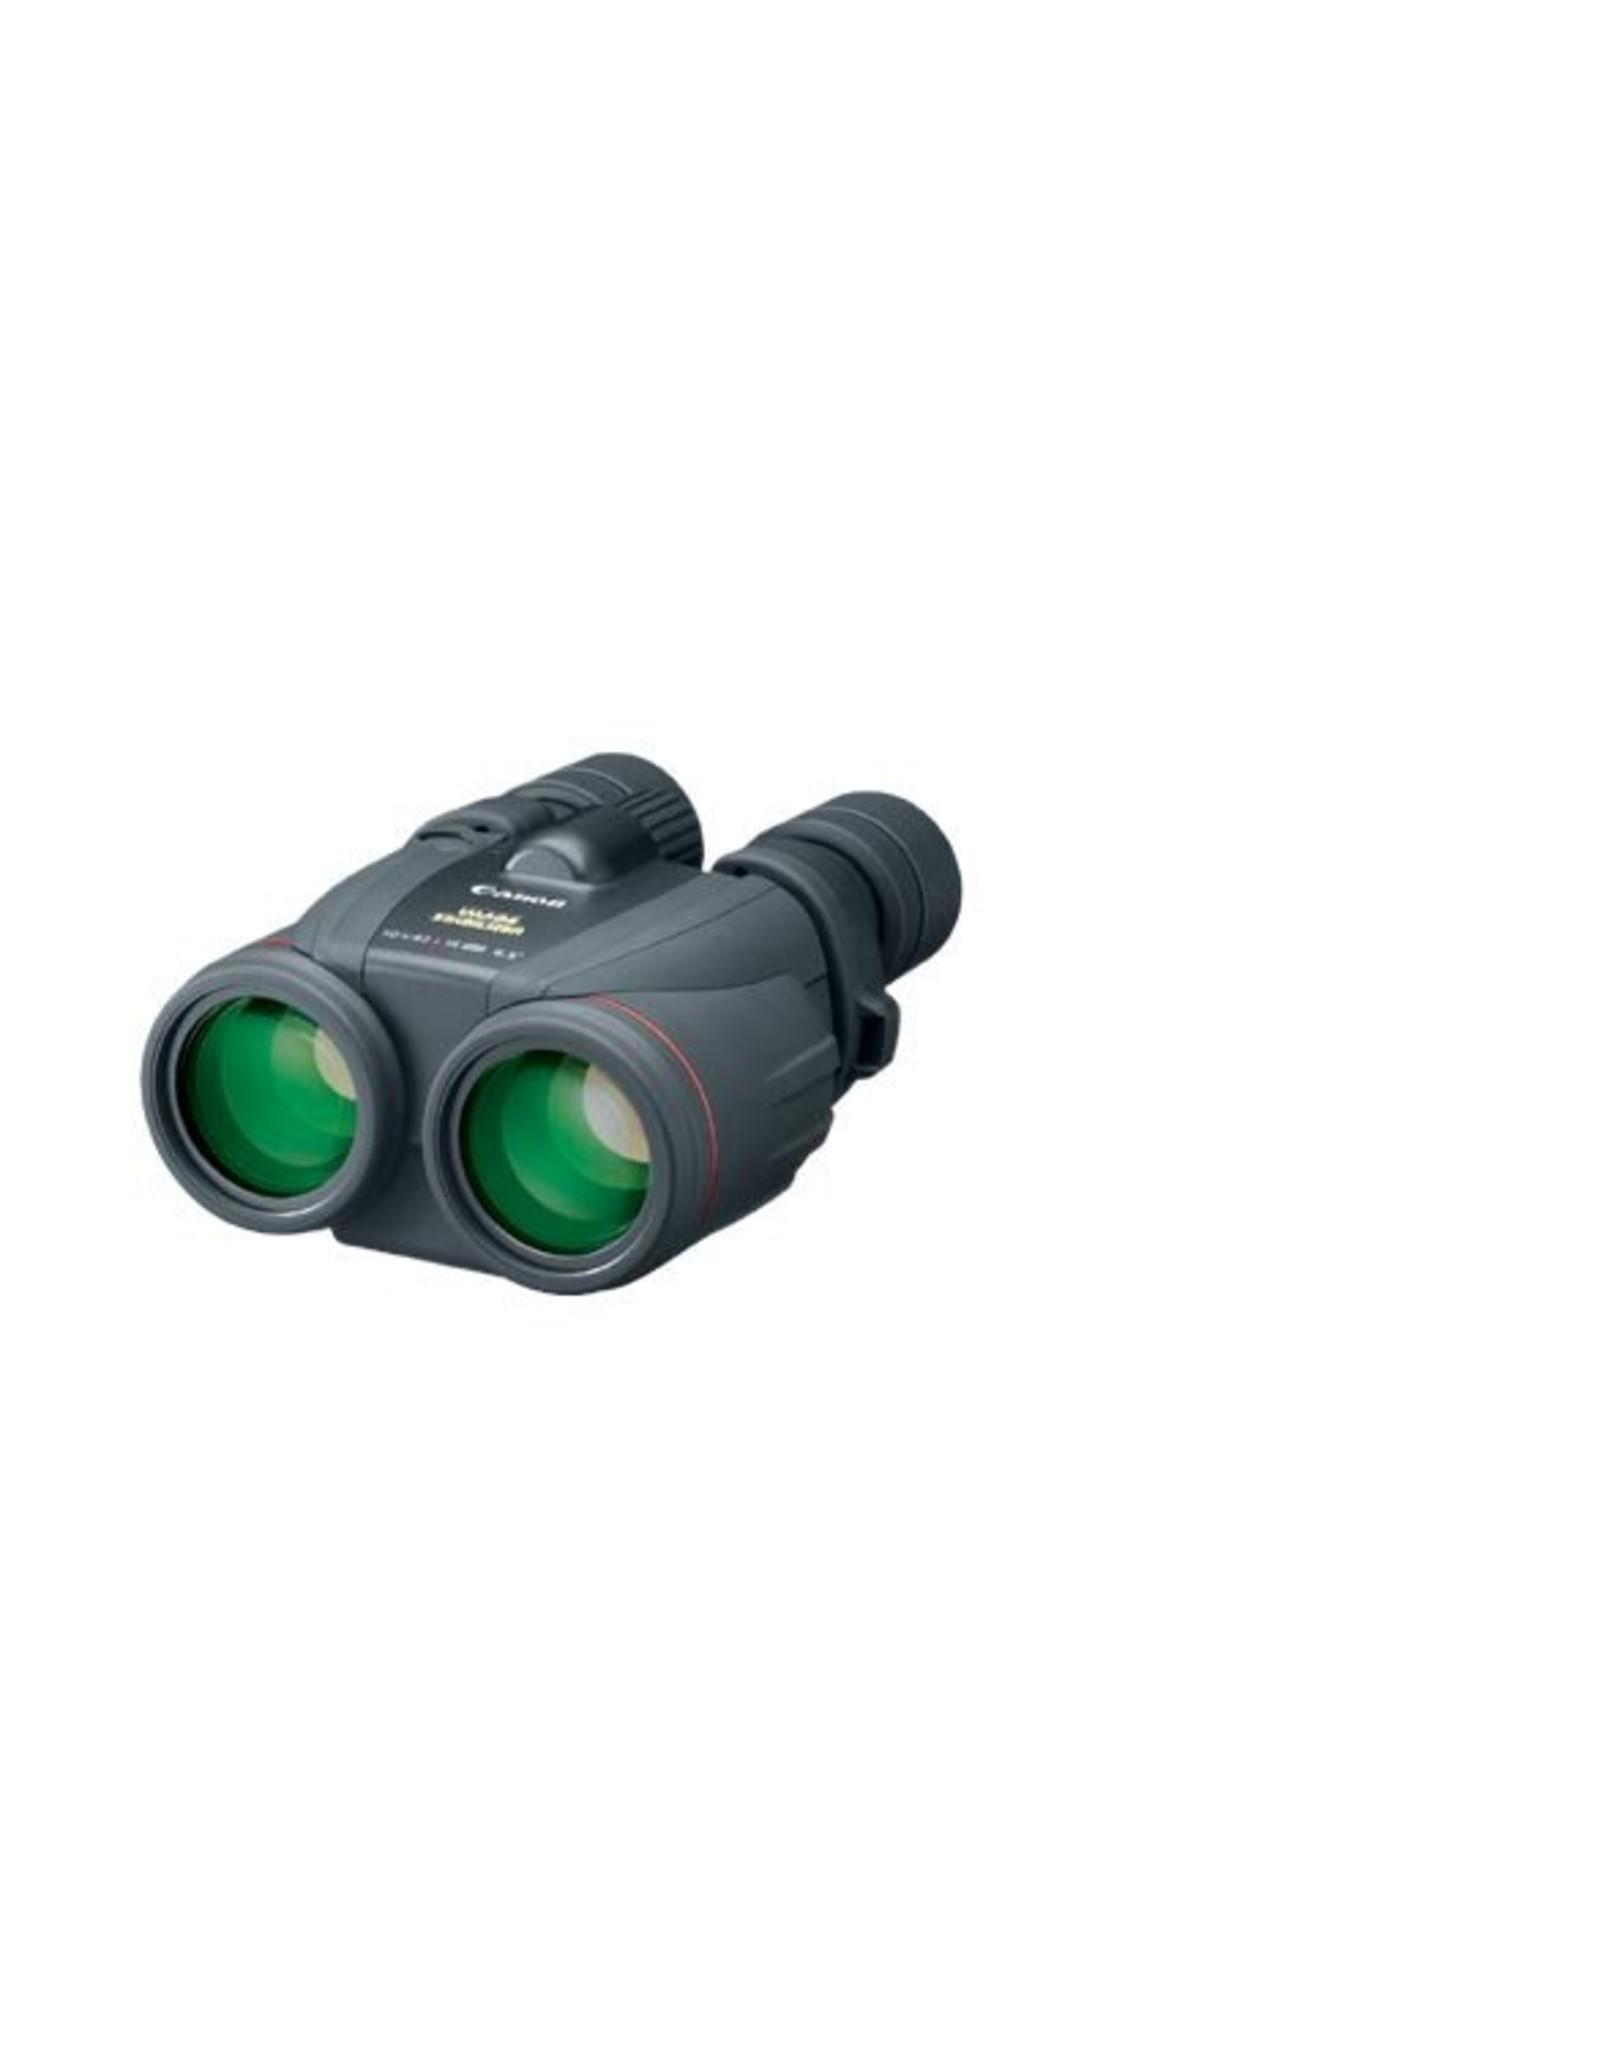 Canon Canon 10x42 L-Series Waterproof Image Stabilized Binoculars